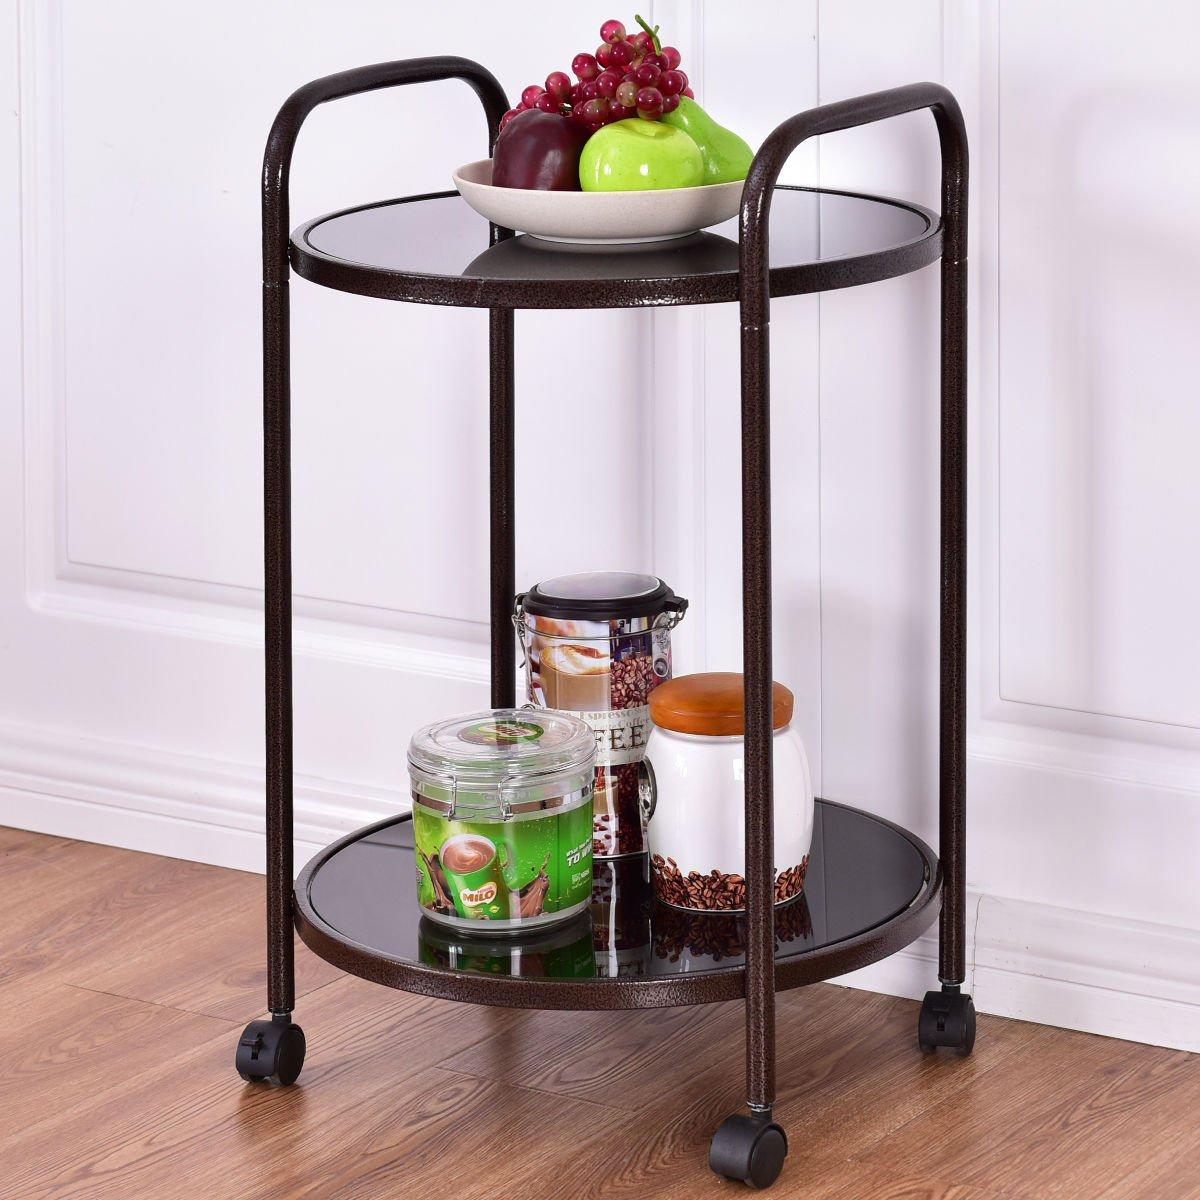 ShopForAllYou Kitchen cart Island 2-Tier Round Rolling Kitchen Trolley Serving Cart Dining Bar Storage Utility New